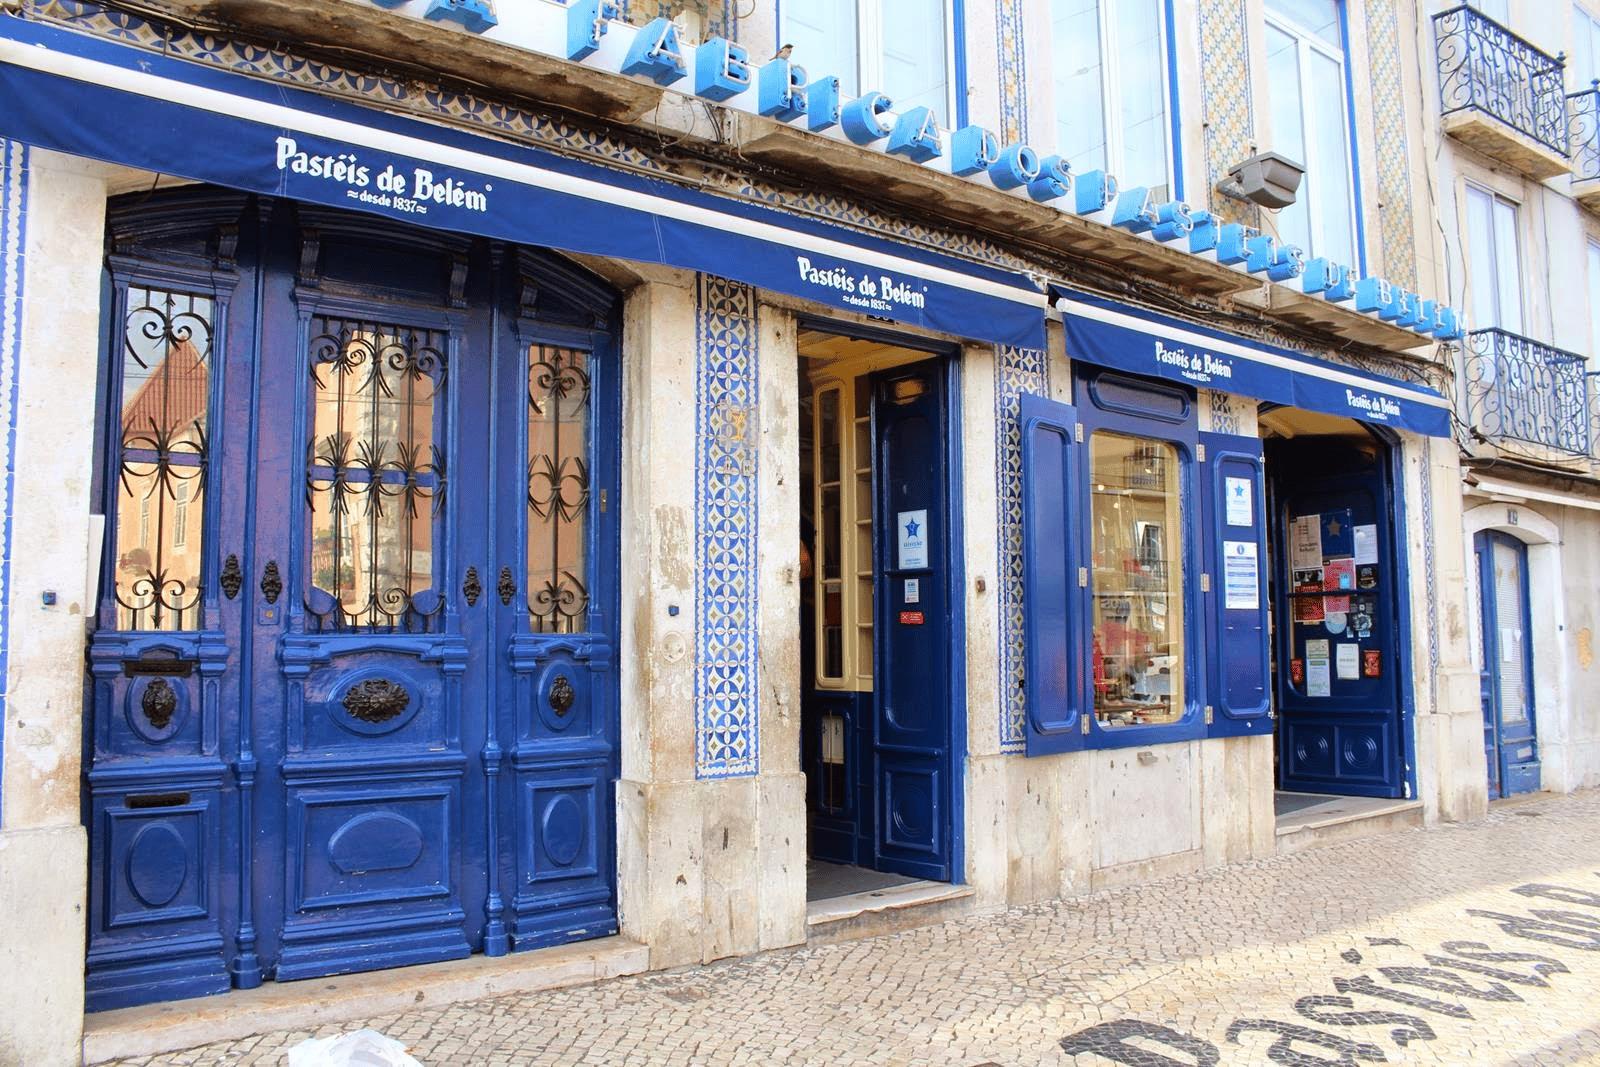 Lisbonne Bélem